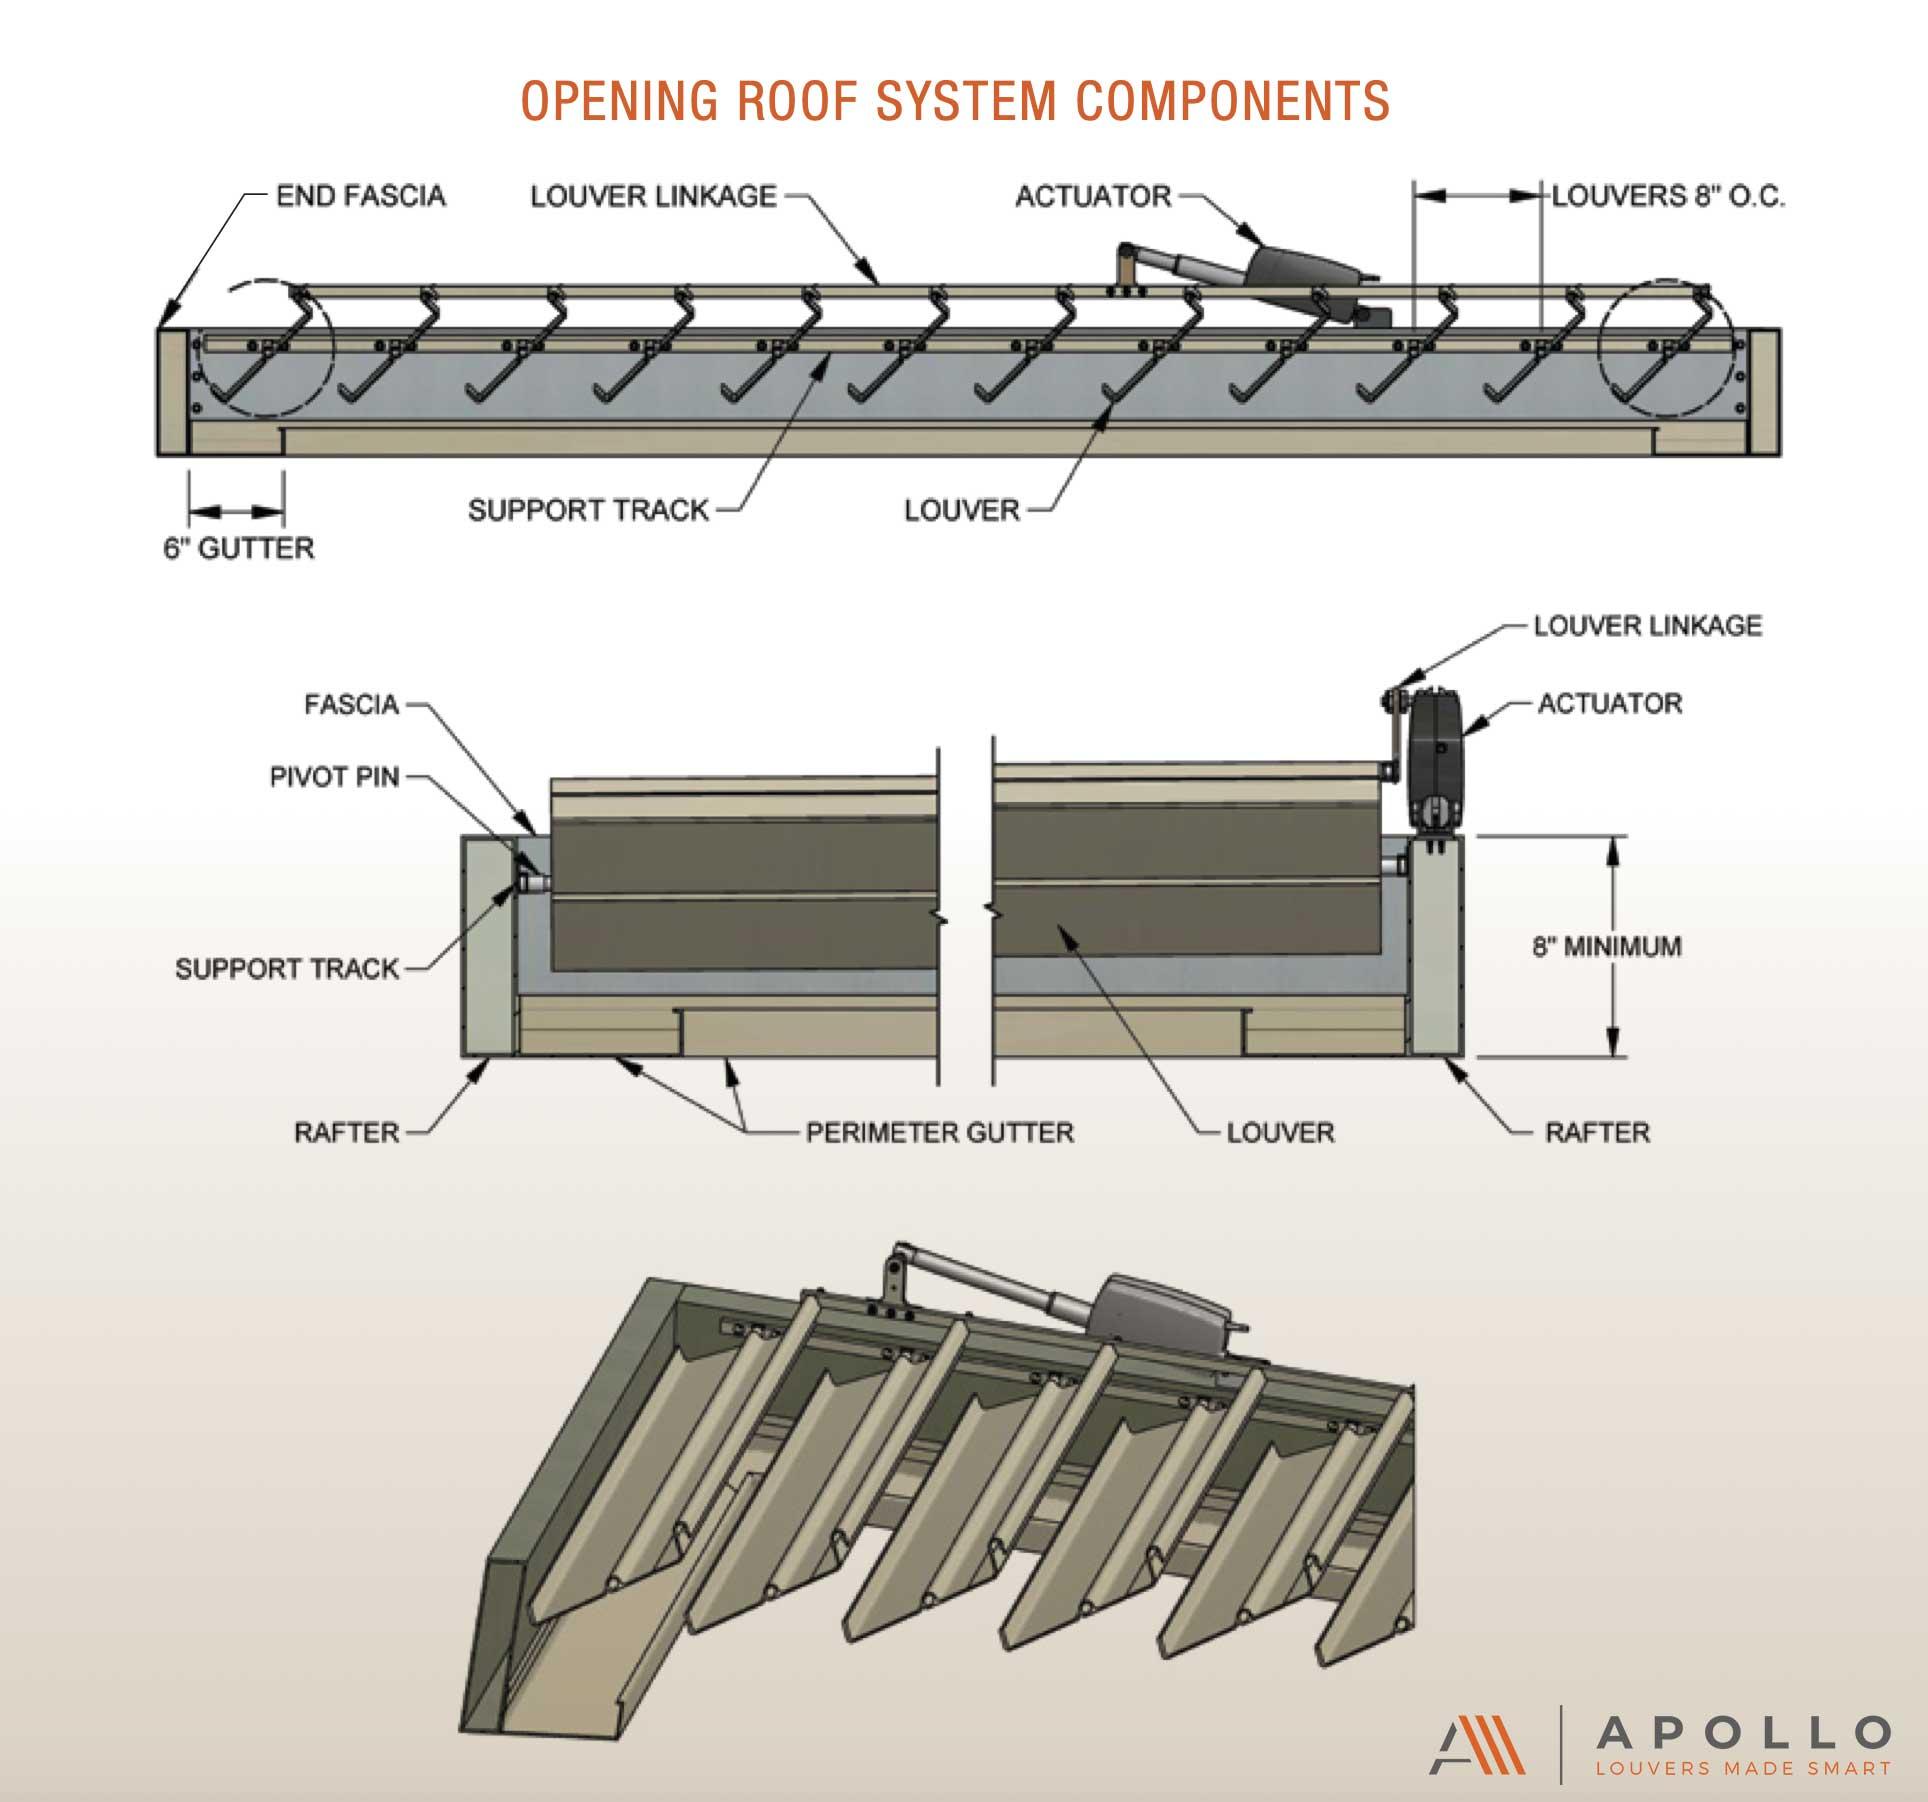 Apollo adjustable patio cover system